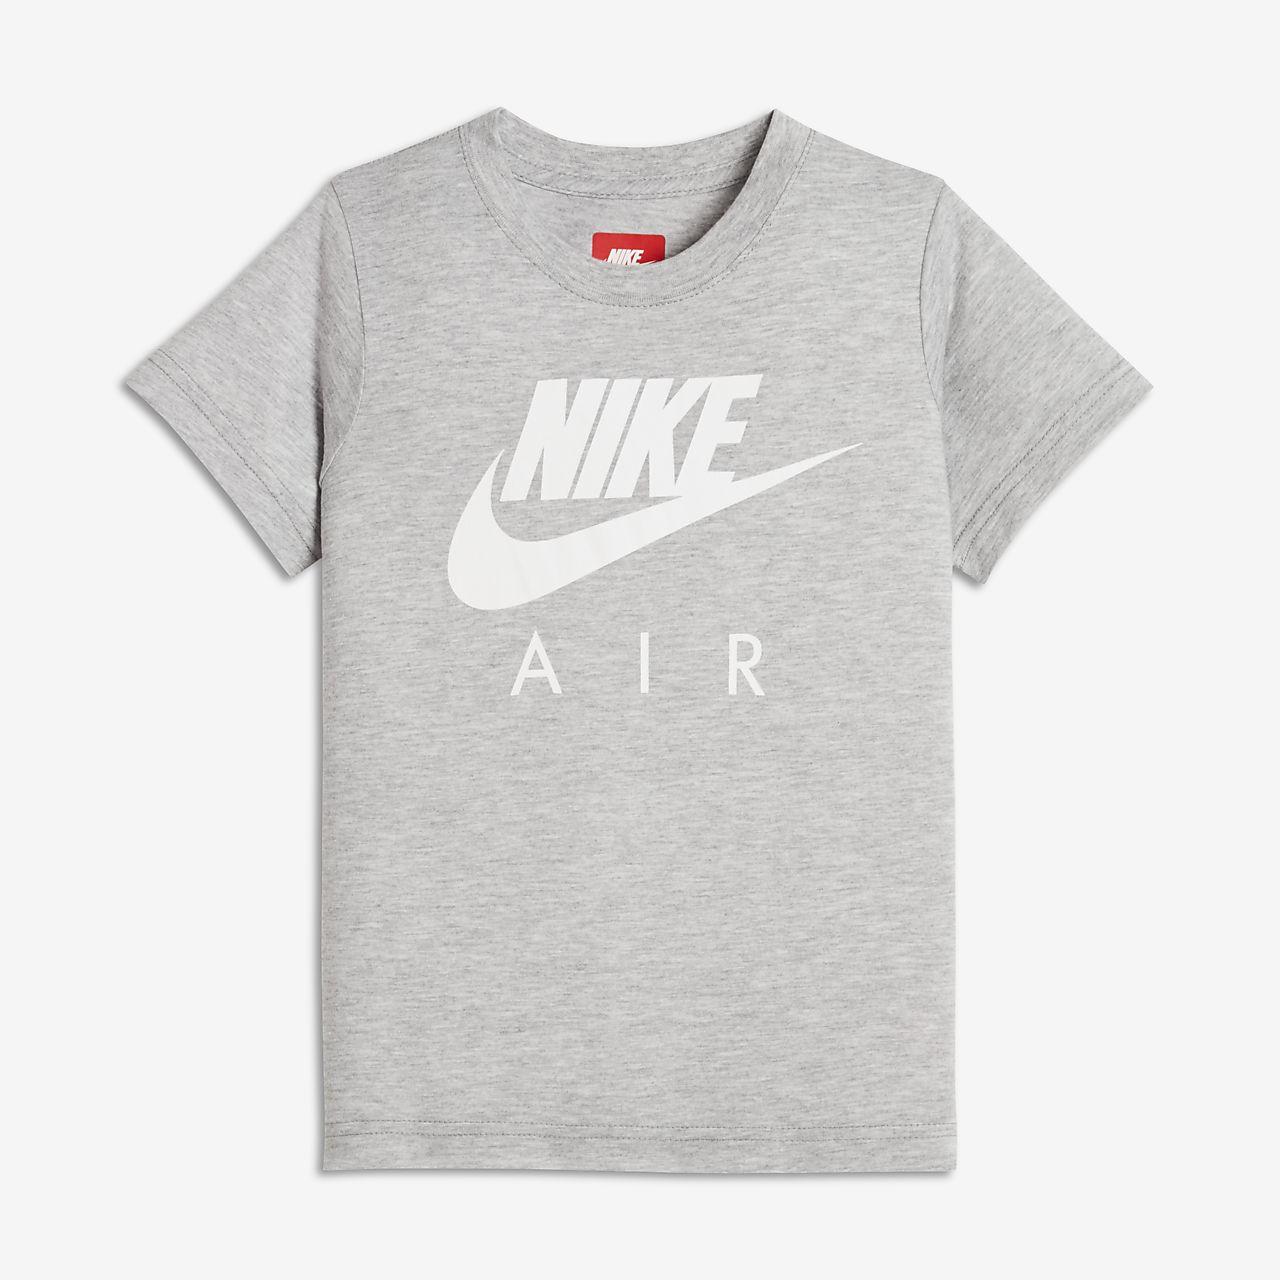 Tričko Nike Air Hybrid pro malé děti (chlapce)